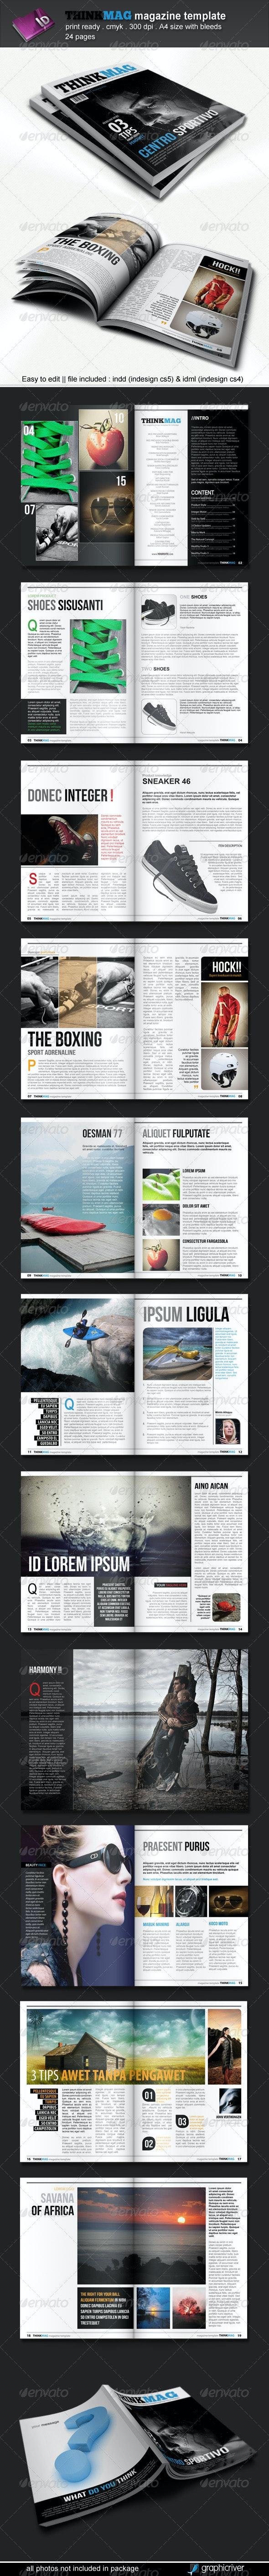 Thinkmag Magazine Template - Magazines Print Templates